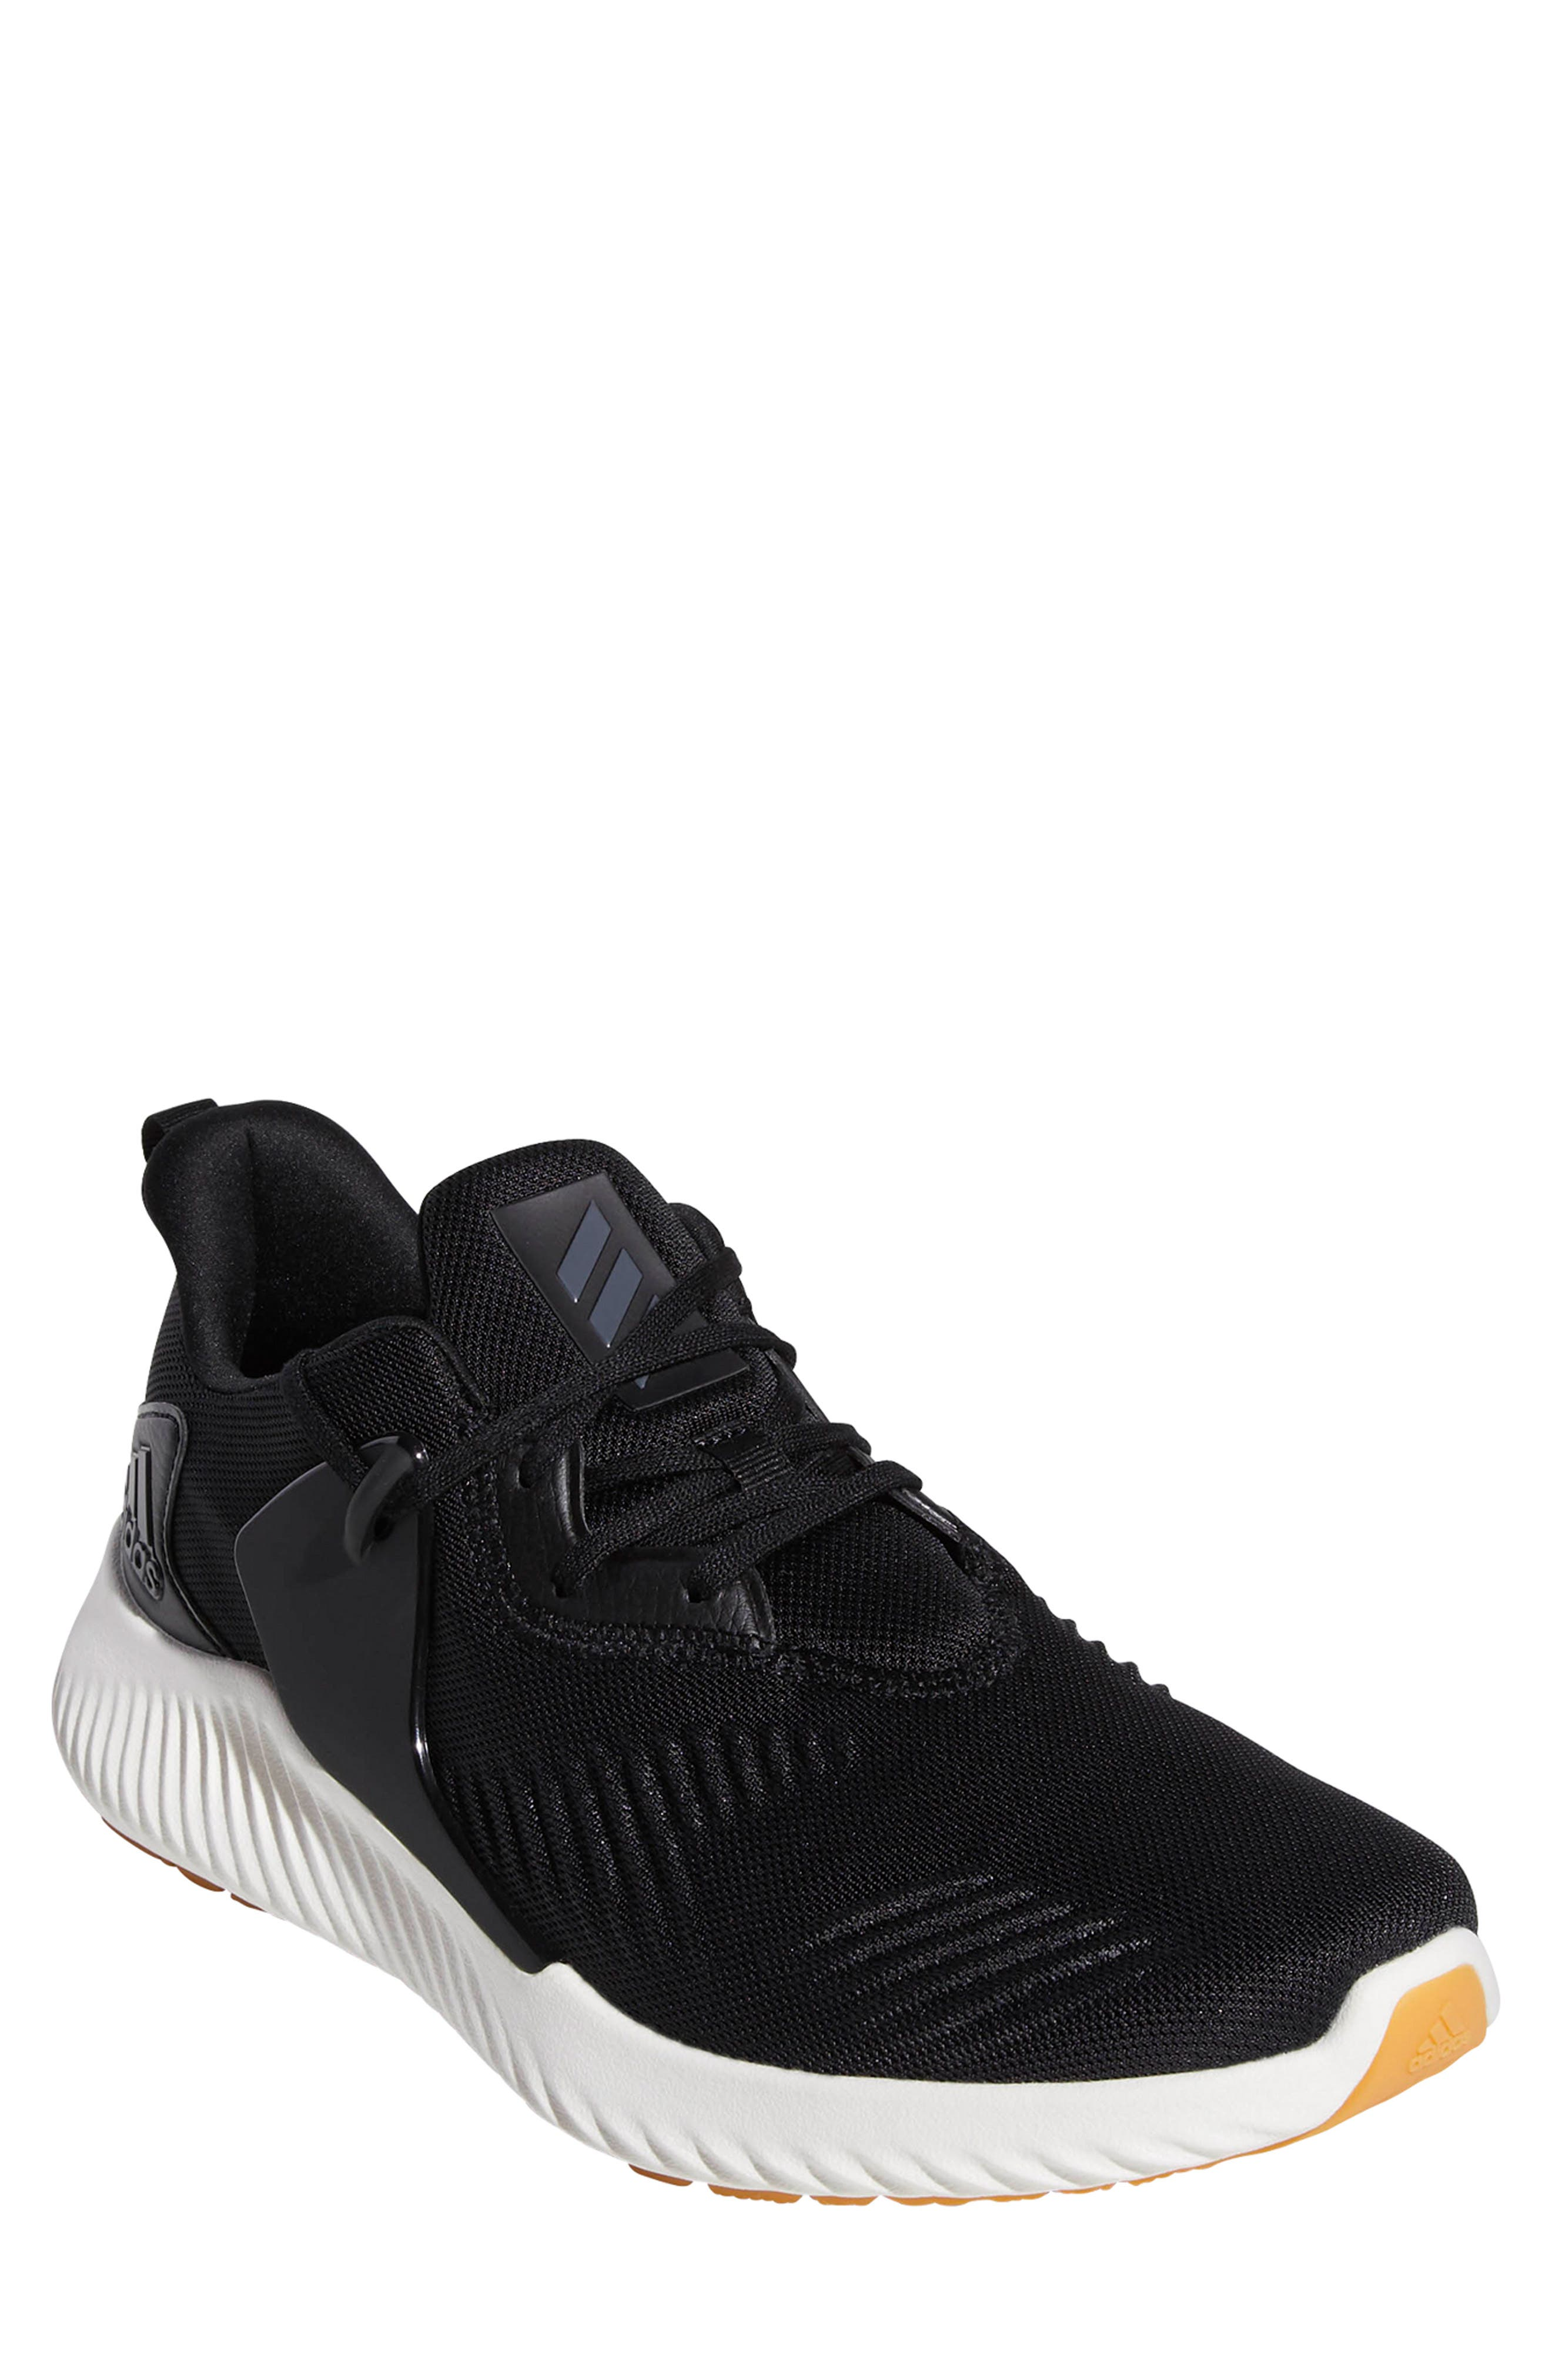 AlphaBounce RC 2 Running Shoe, Main, color, CORE BLACK/ NIGHT/ CORE BLACK